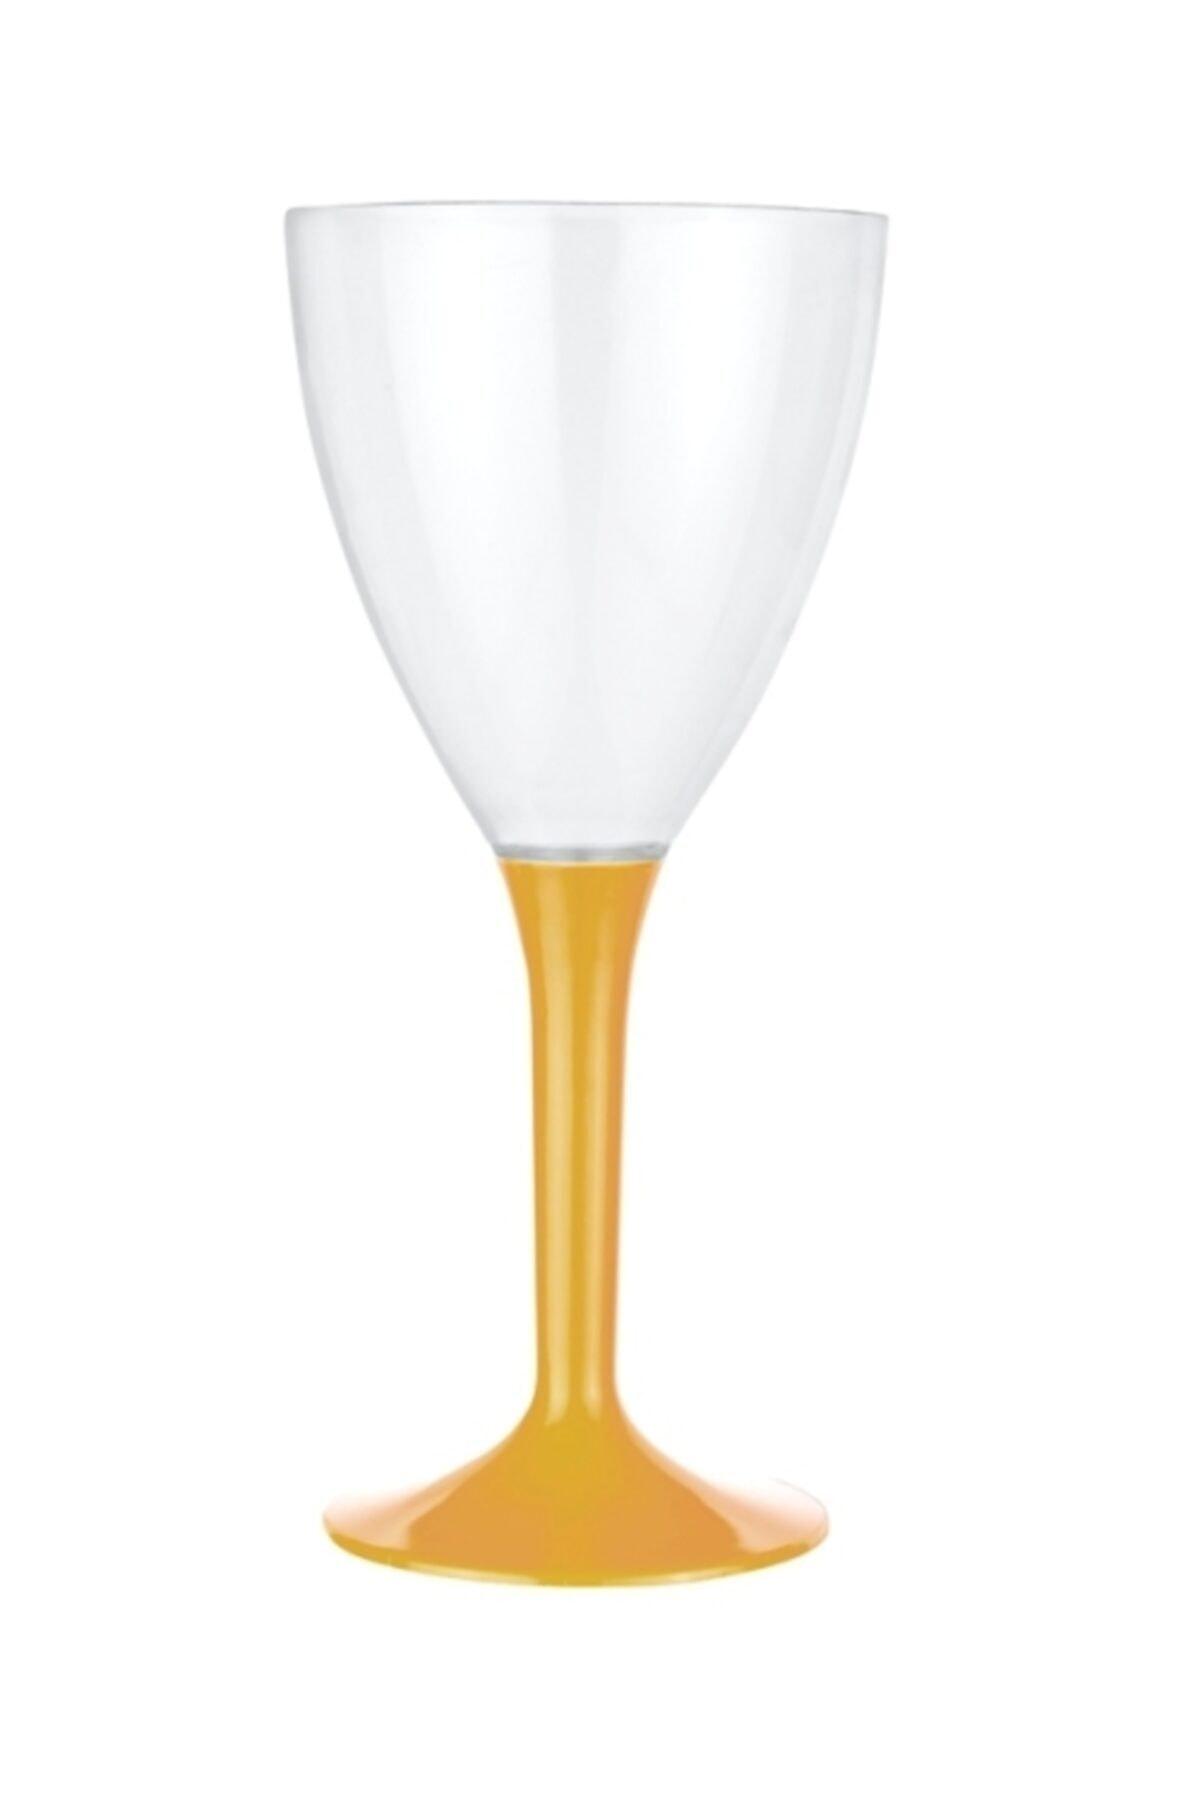 Gold Renk Plastik Şarap Kadehi 10 Adet